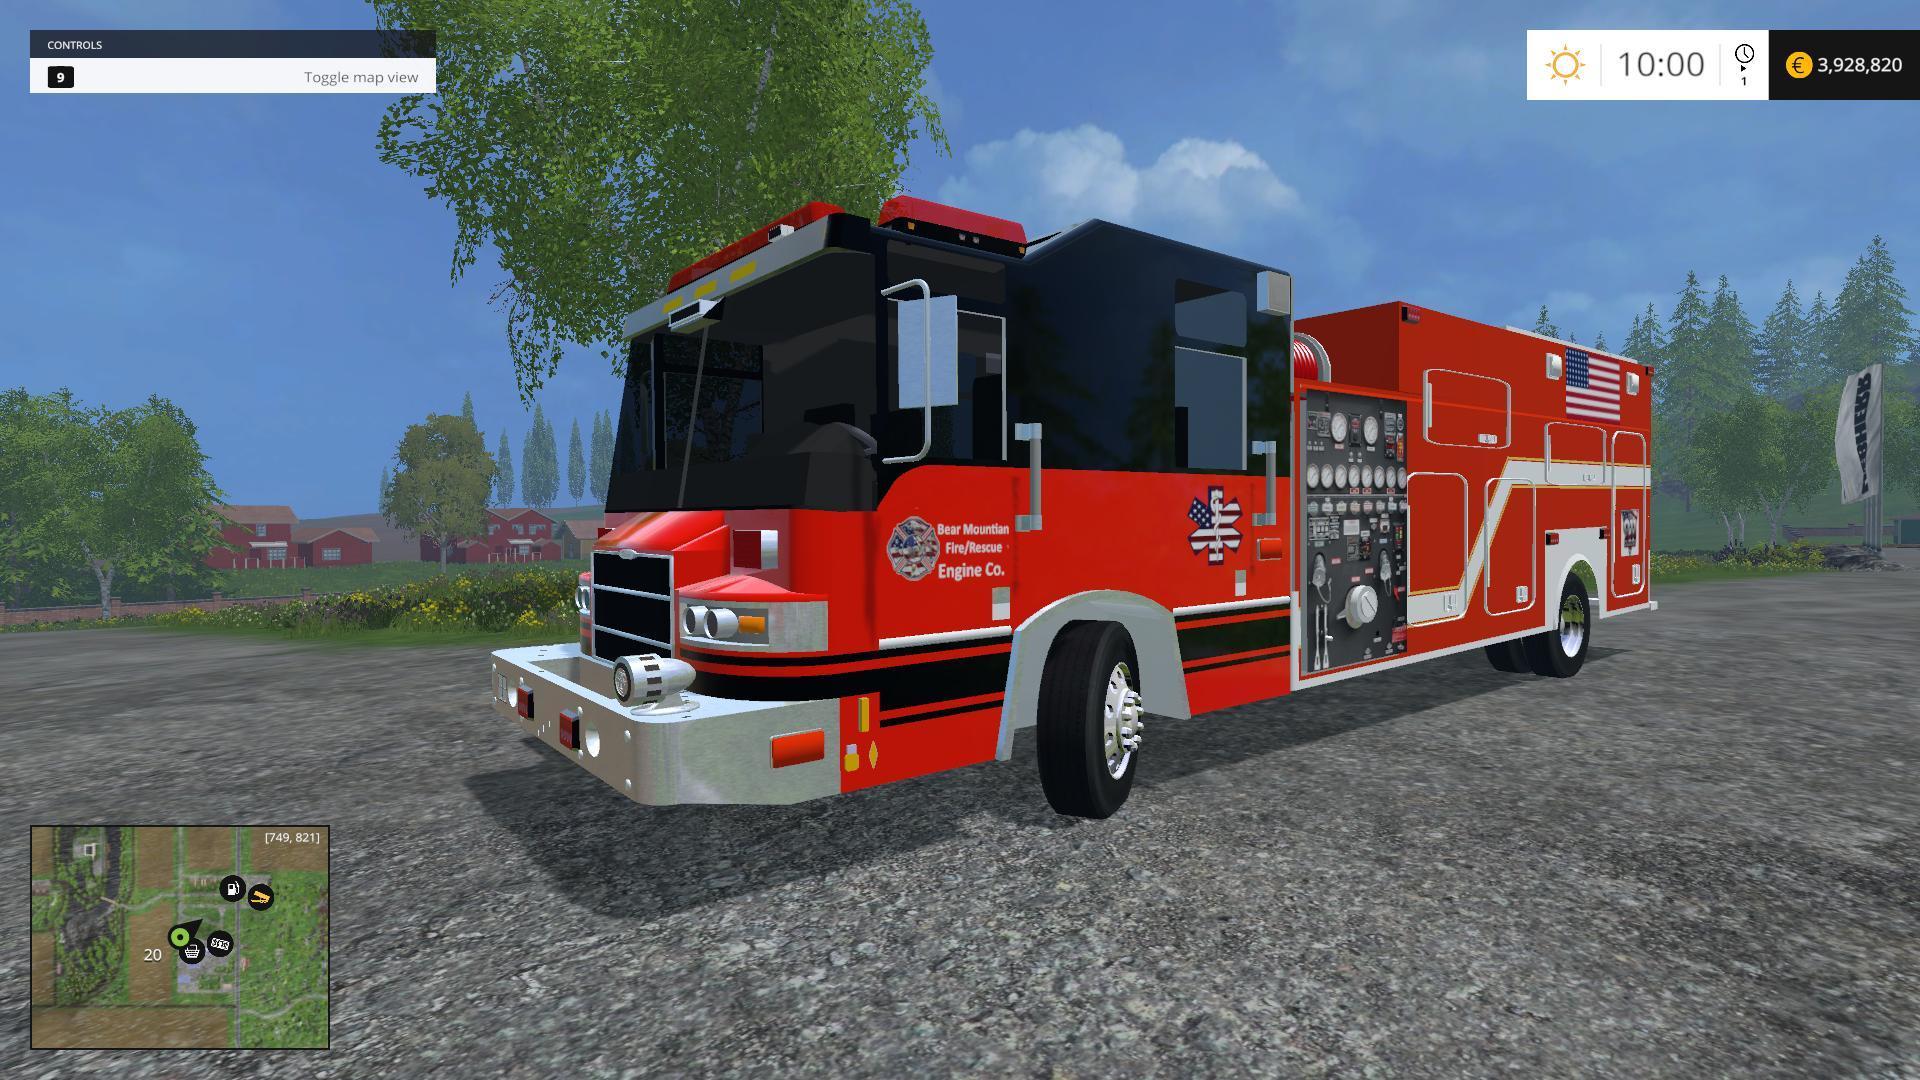 U S FIRE TRUCK [LEAKED] V1 0 • Farming simulator 19, 17, 15